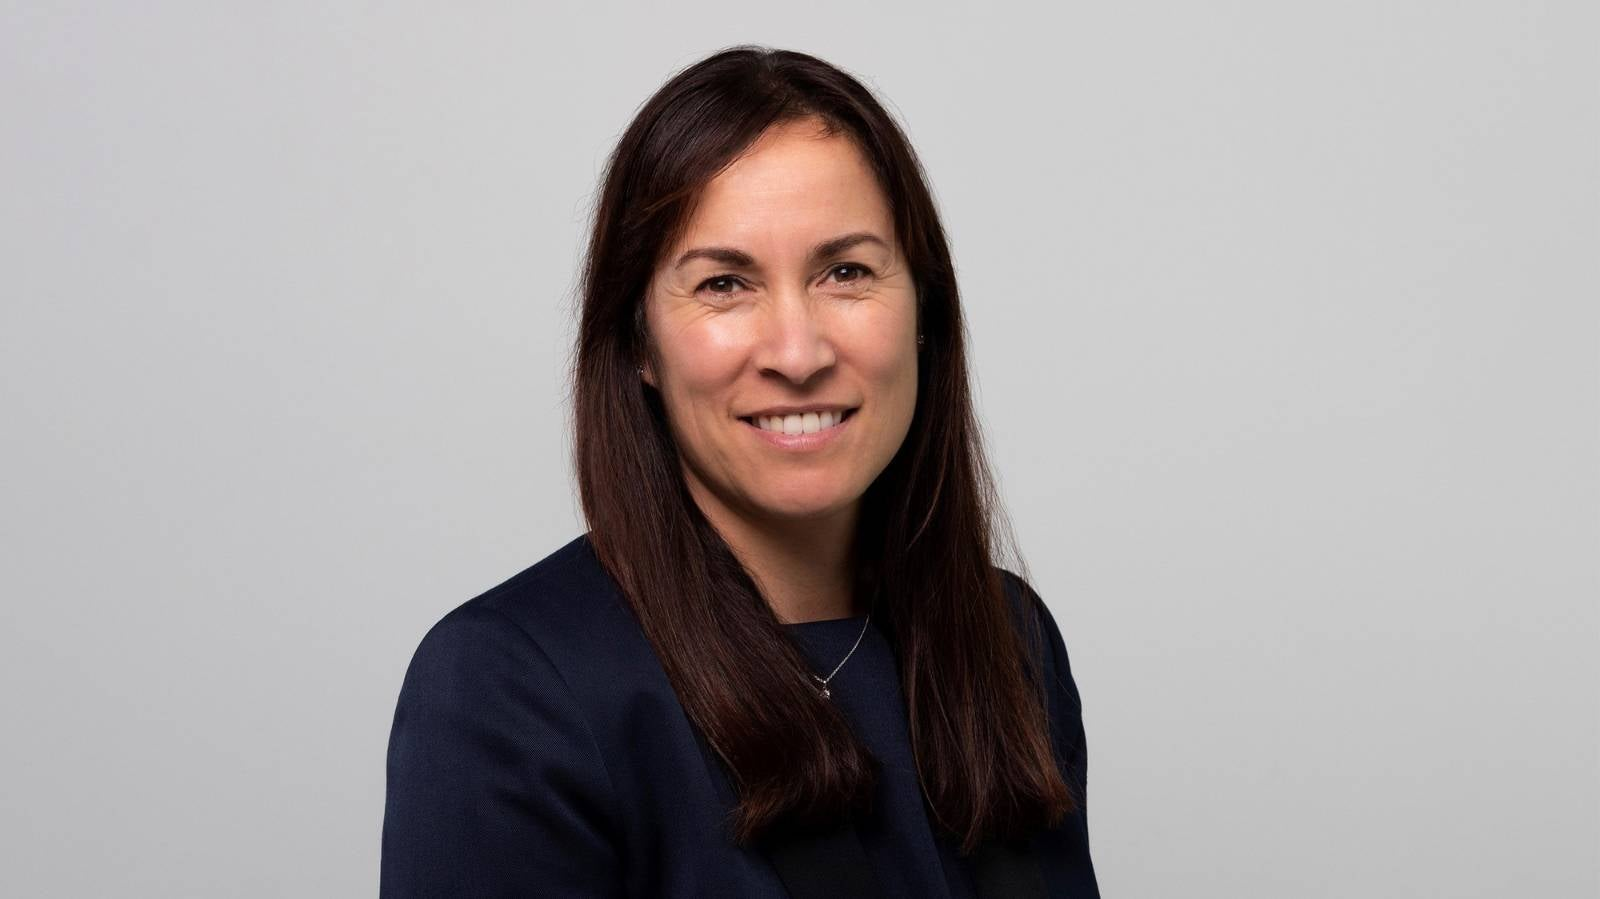 The Monitor Q&A — Nadine Tunley, HortNZ chief executive